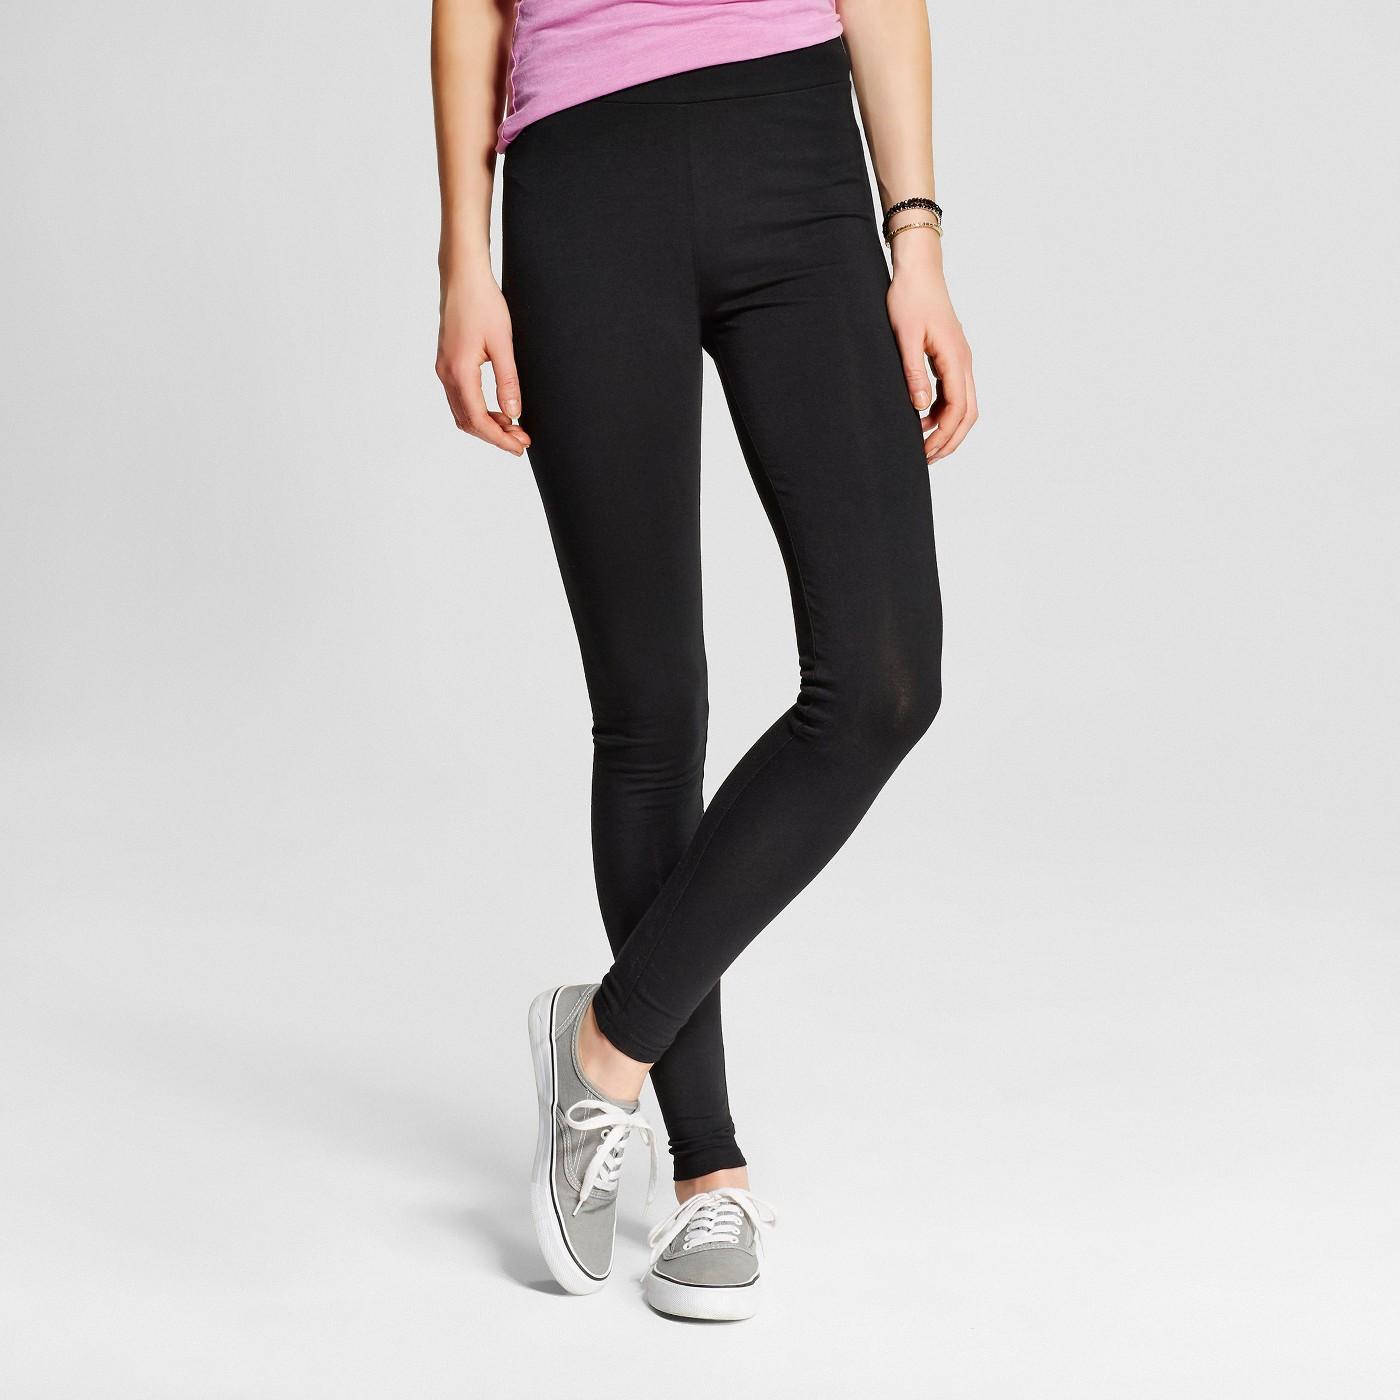 Women's Leggings - Mossimo Supply Co.™ Black - image 1 of 2